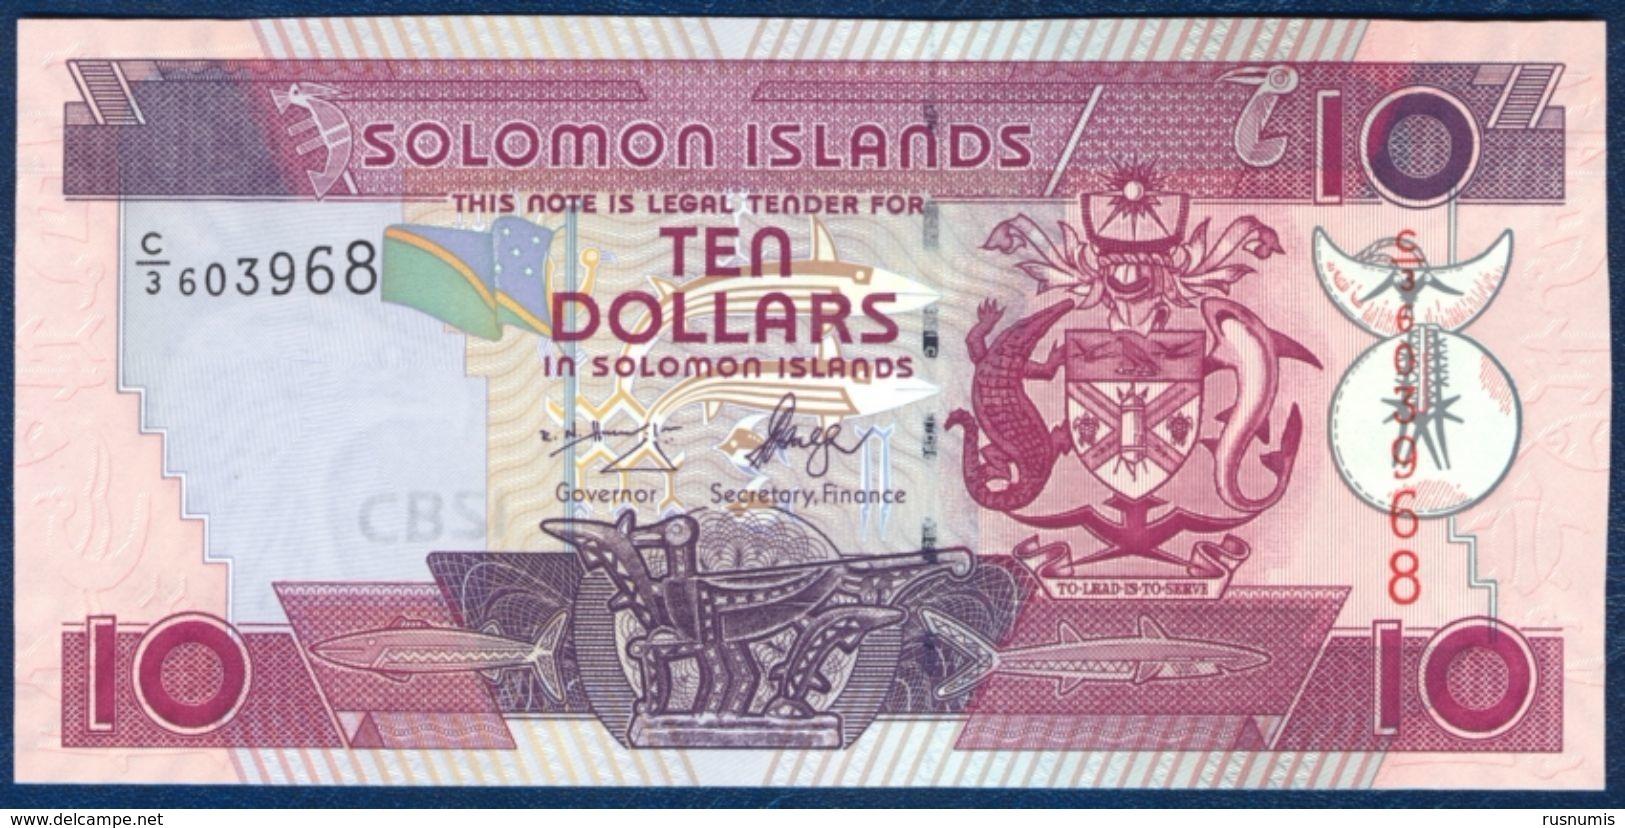 SOLOMON ISLANDS 10 DOLLARS P-27a 2005 UNC - Salomonseilanden